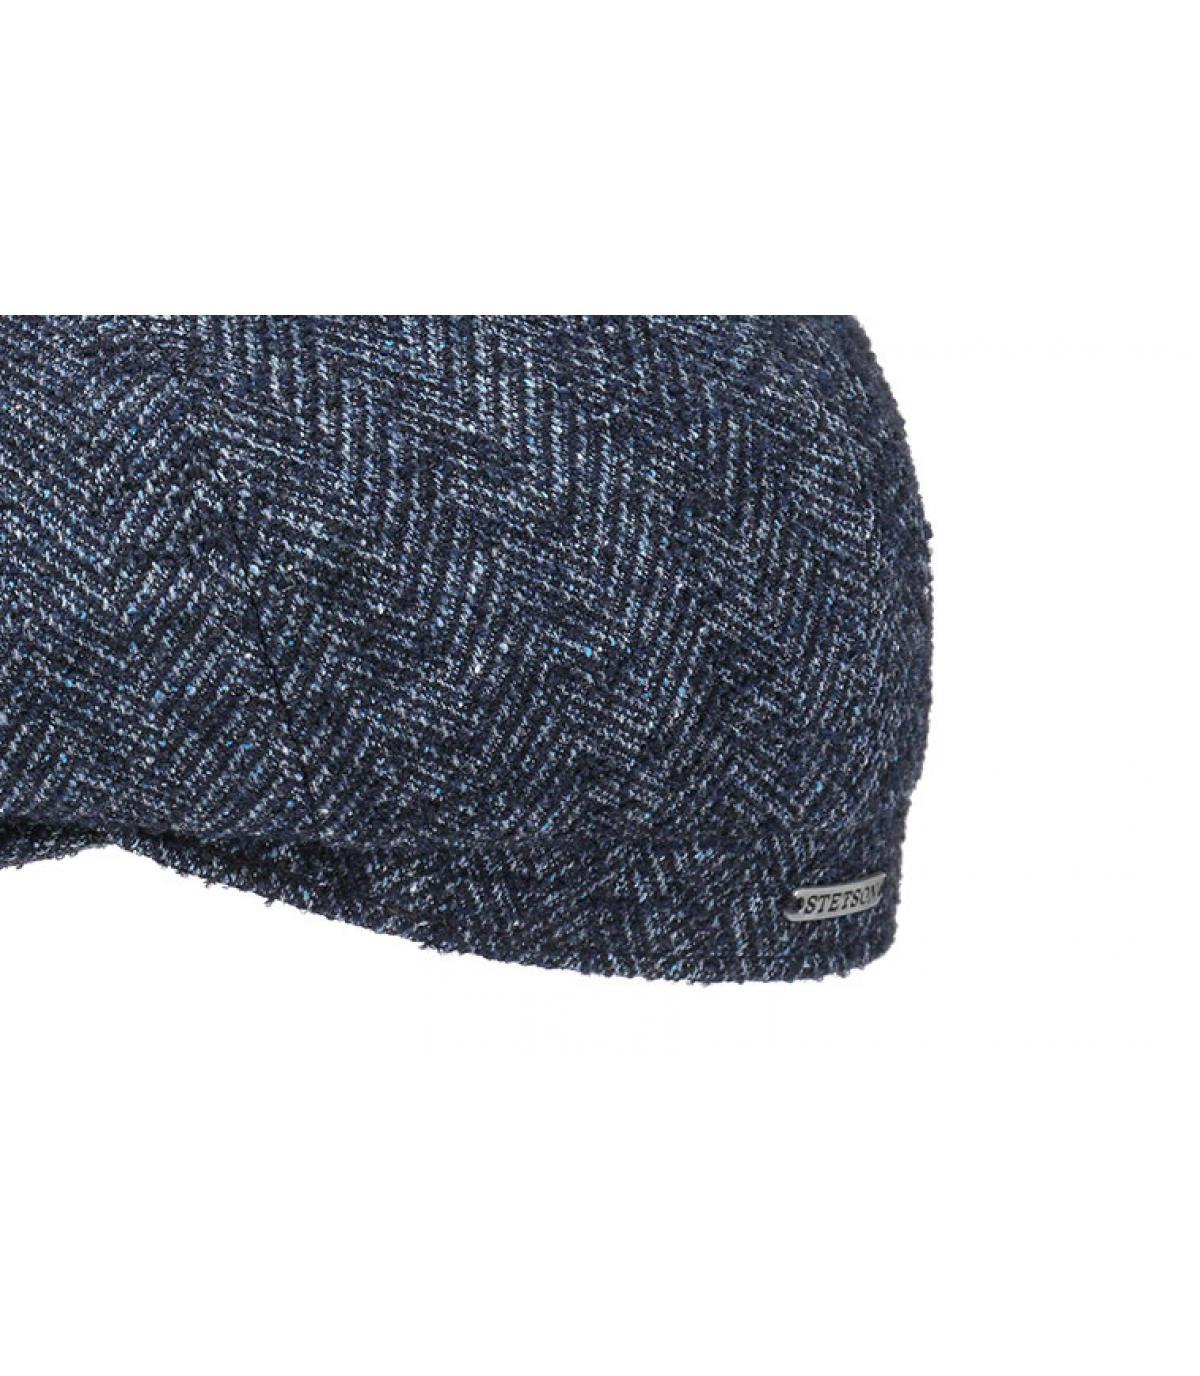 ... berretto strillone lana blu - Hatteras Virgin Wool blue herringbone  Stetson - image 3 dbbe55b807a7